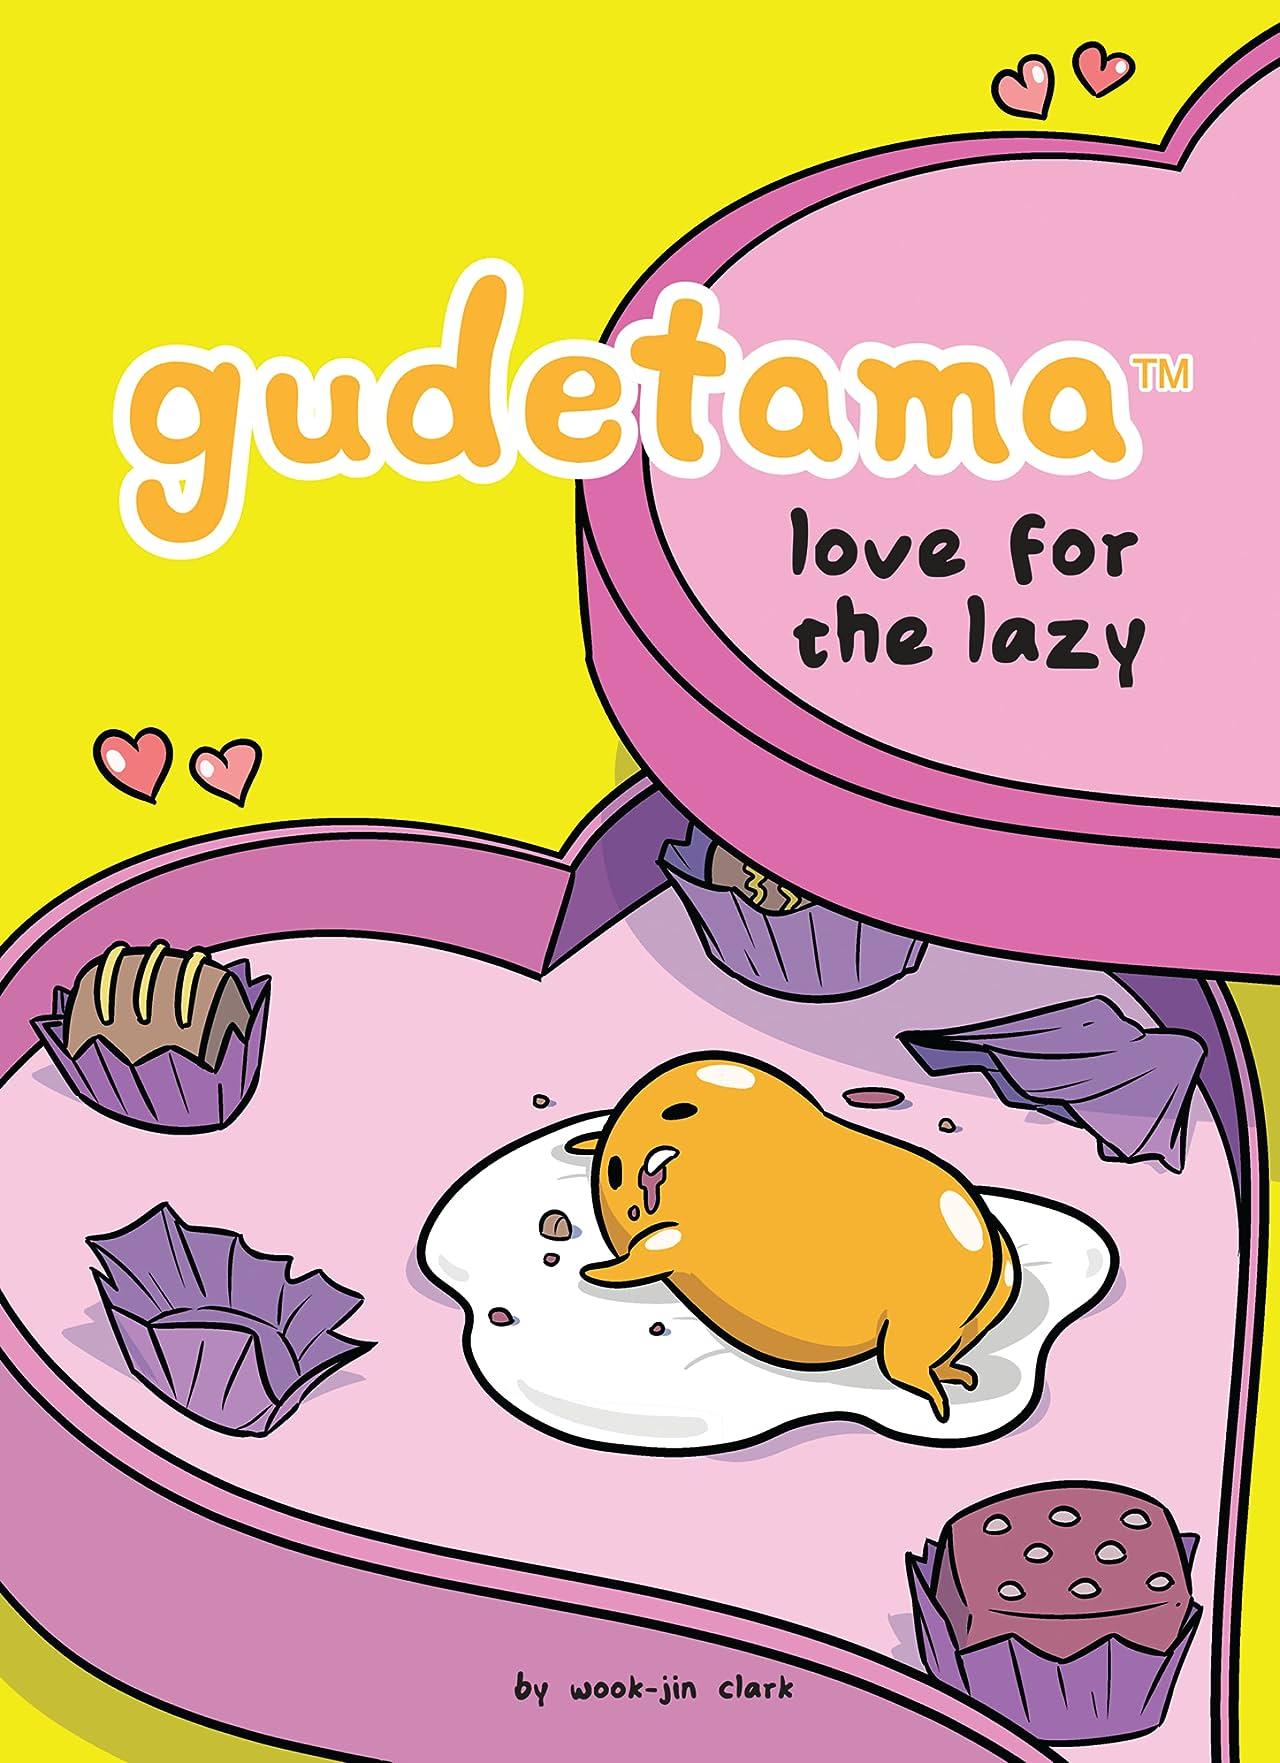 Gudetama: Love for the Lazy